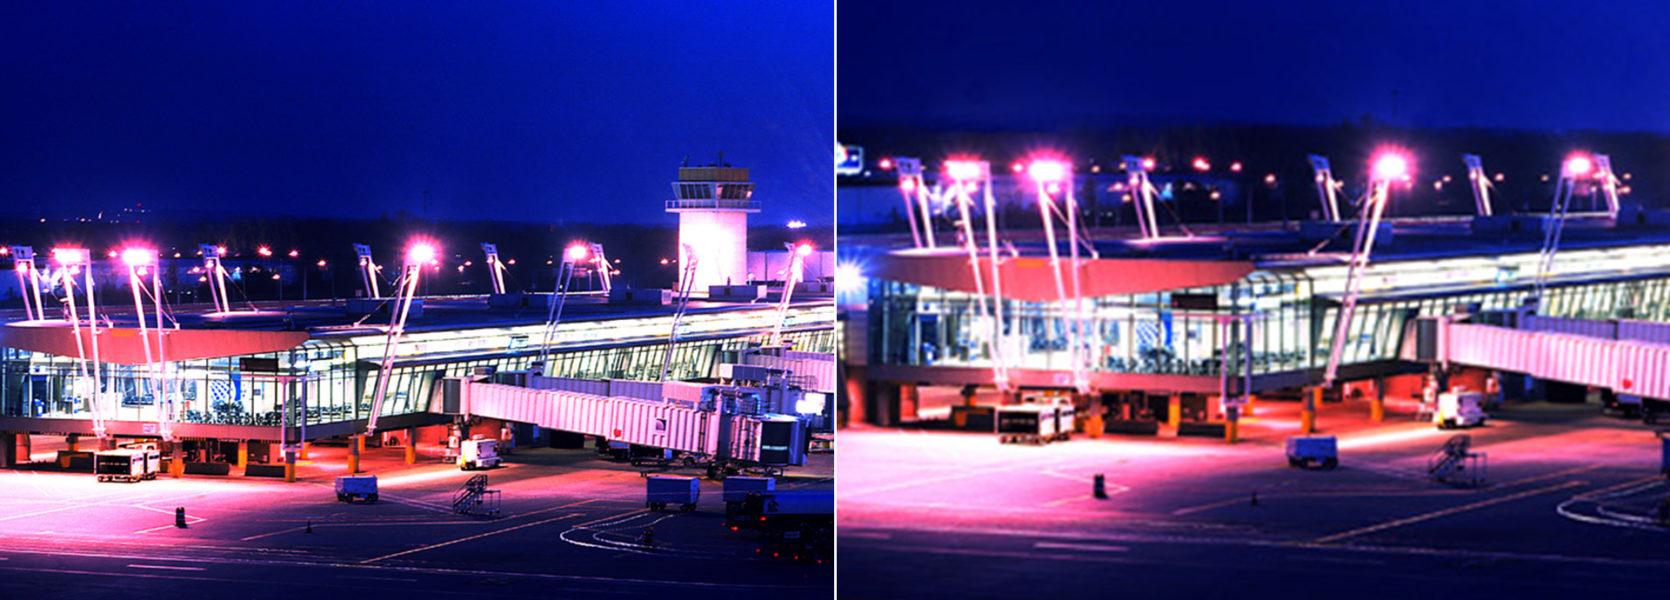 Continental Terminal Hopkins International Airport